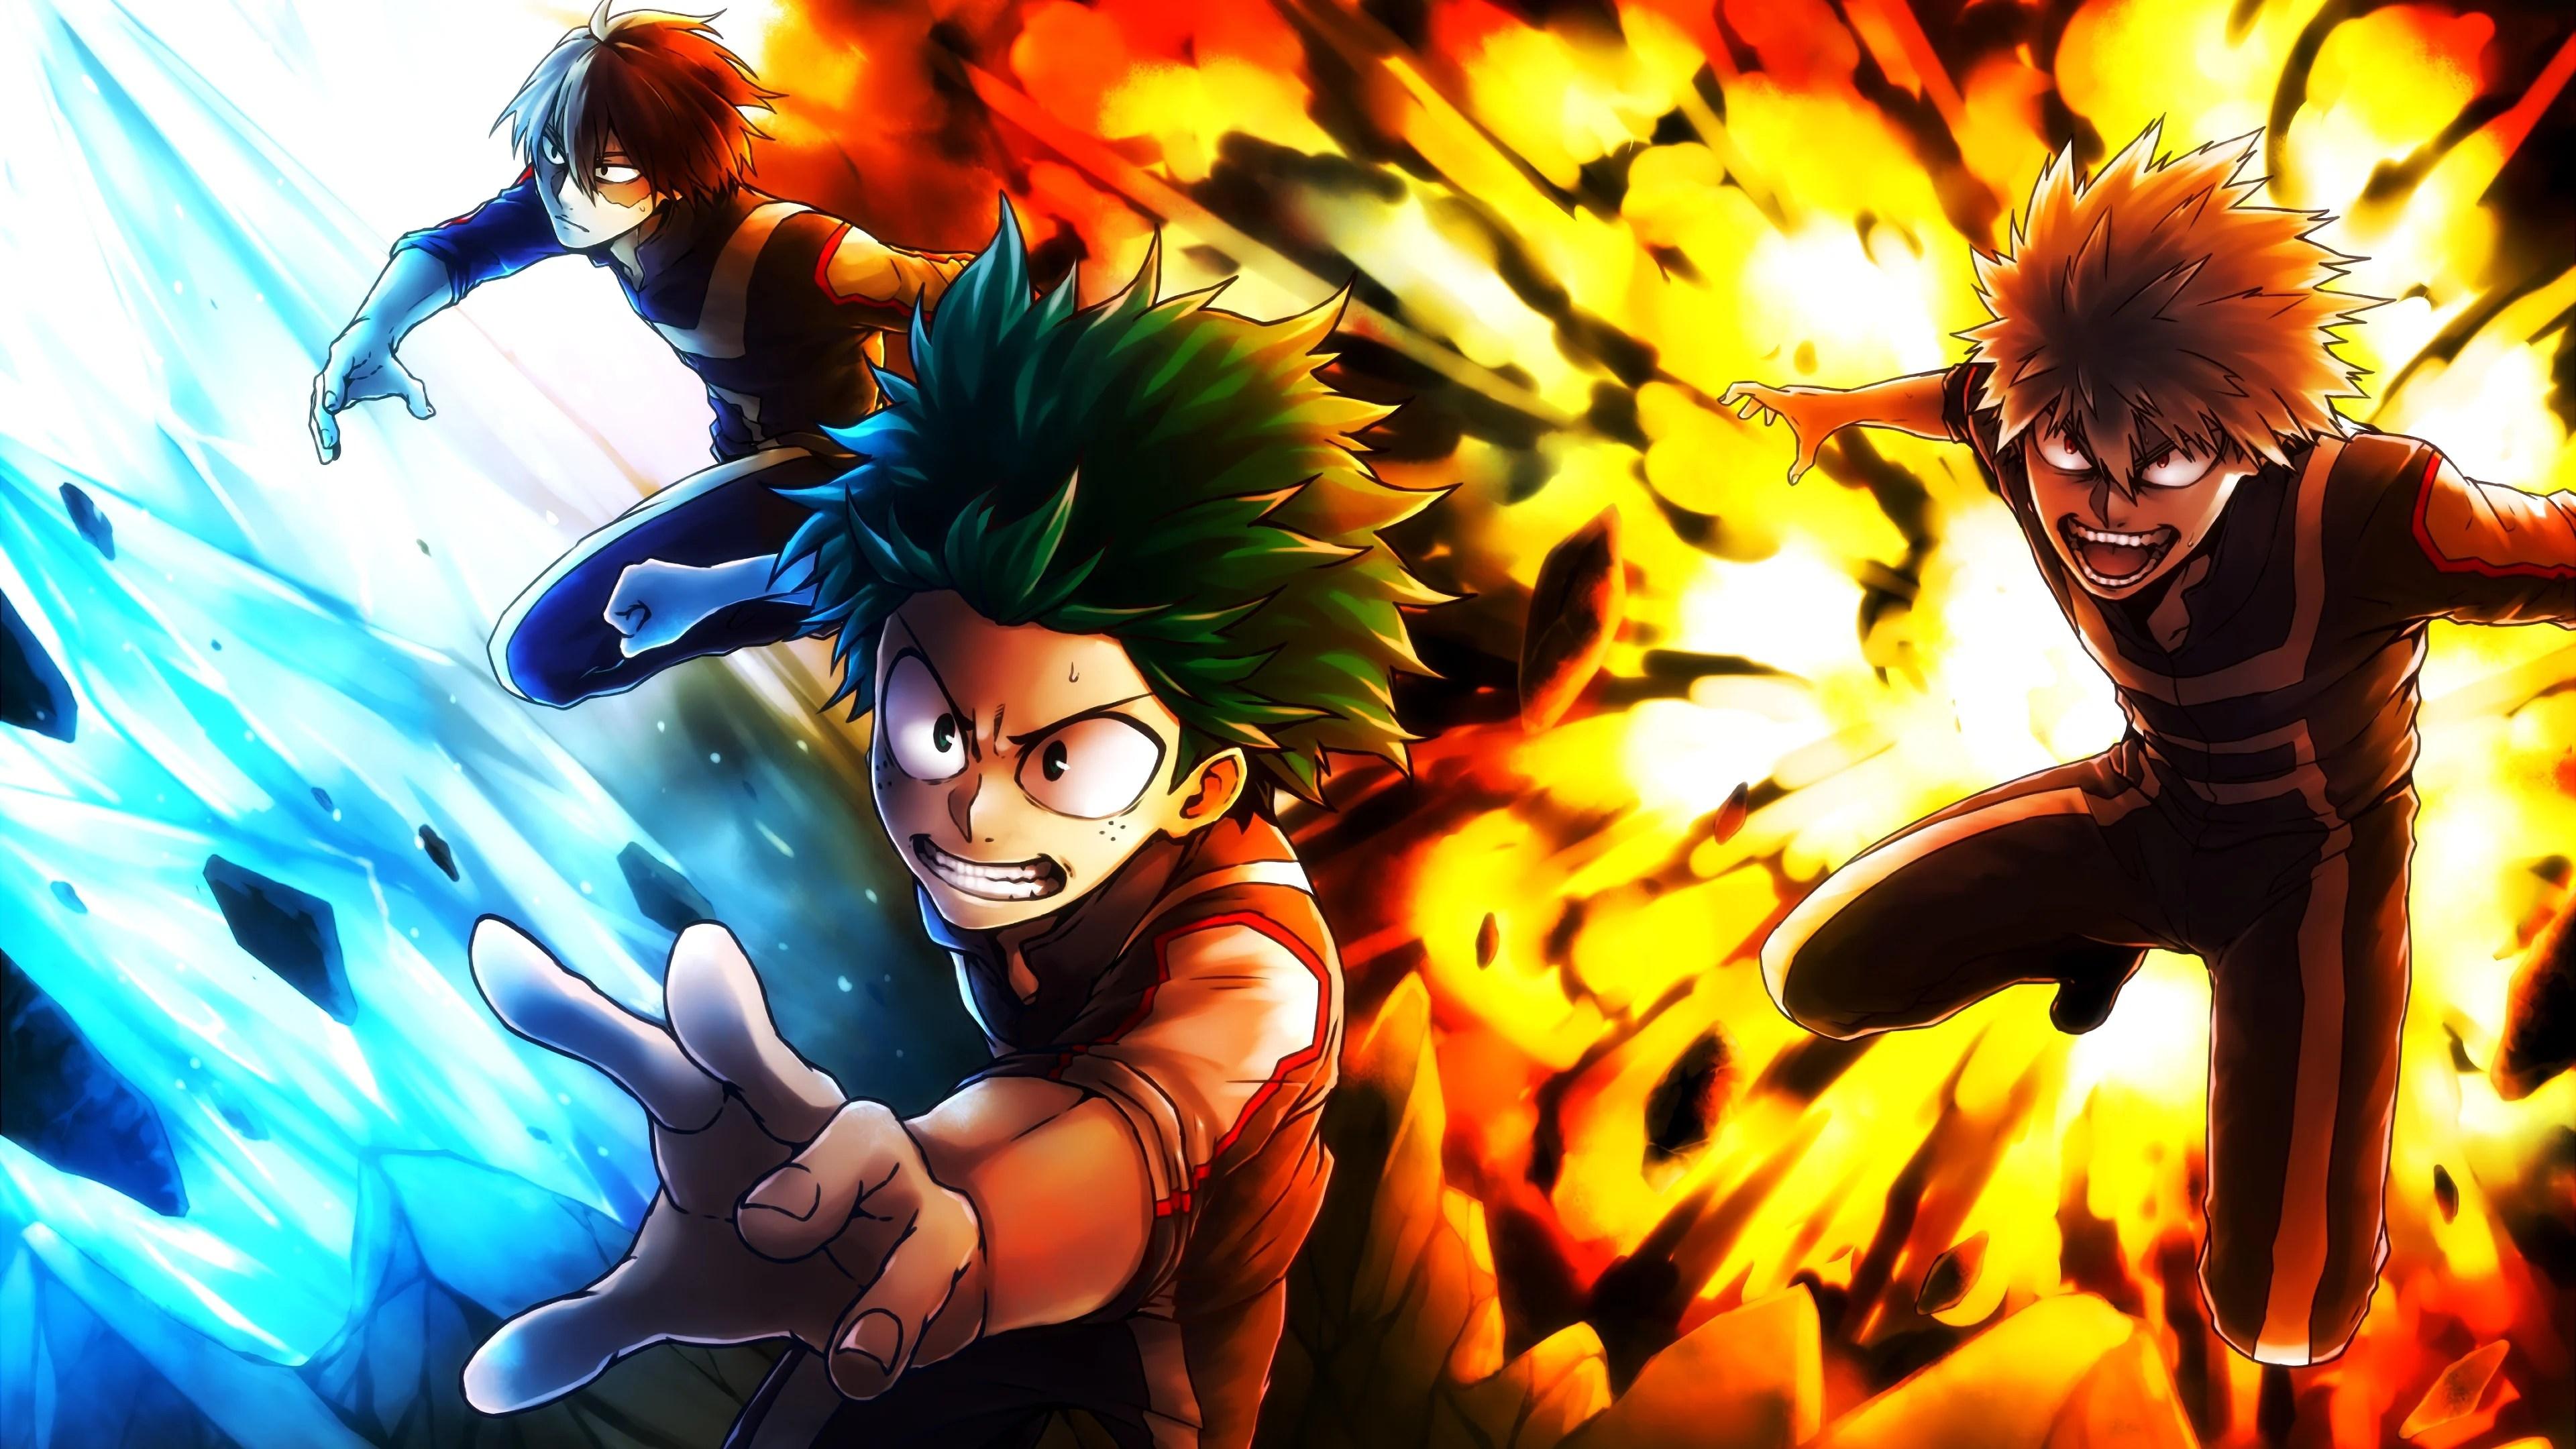 Hope you guys like them. My Hero Academia Anime Wallpaper 4k Ultra HD ID:3383